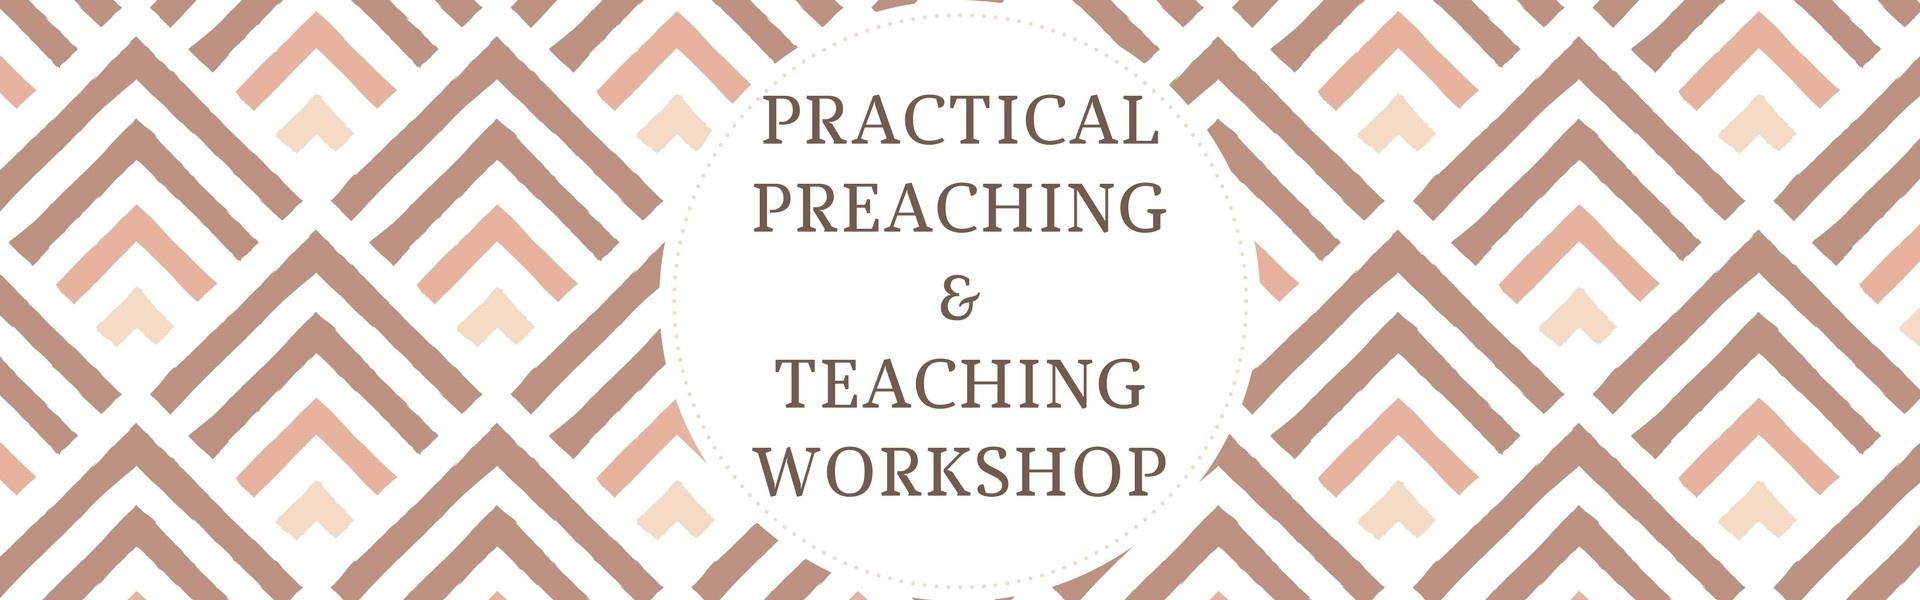 Practical Preaching and Teaching Workshop